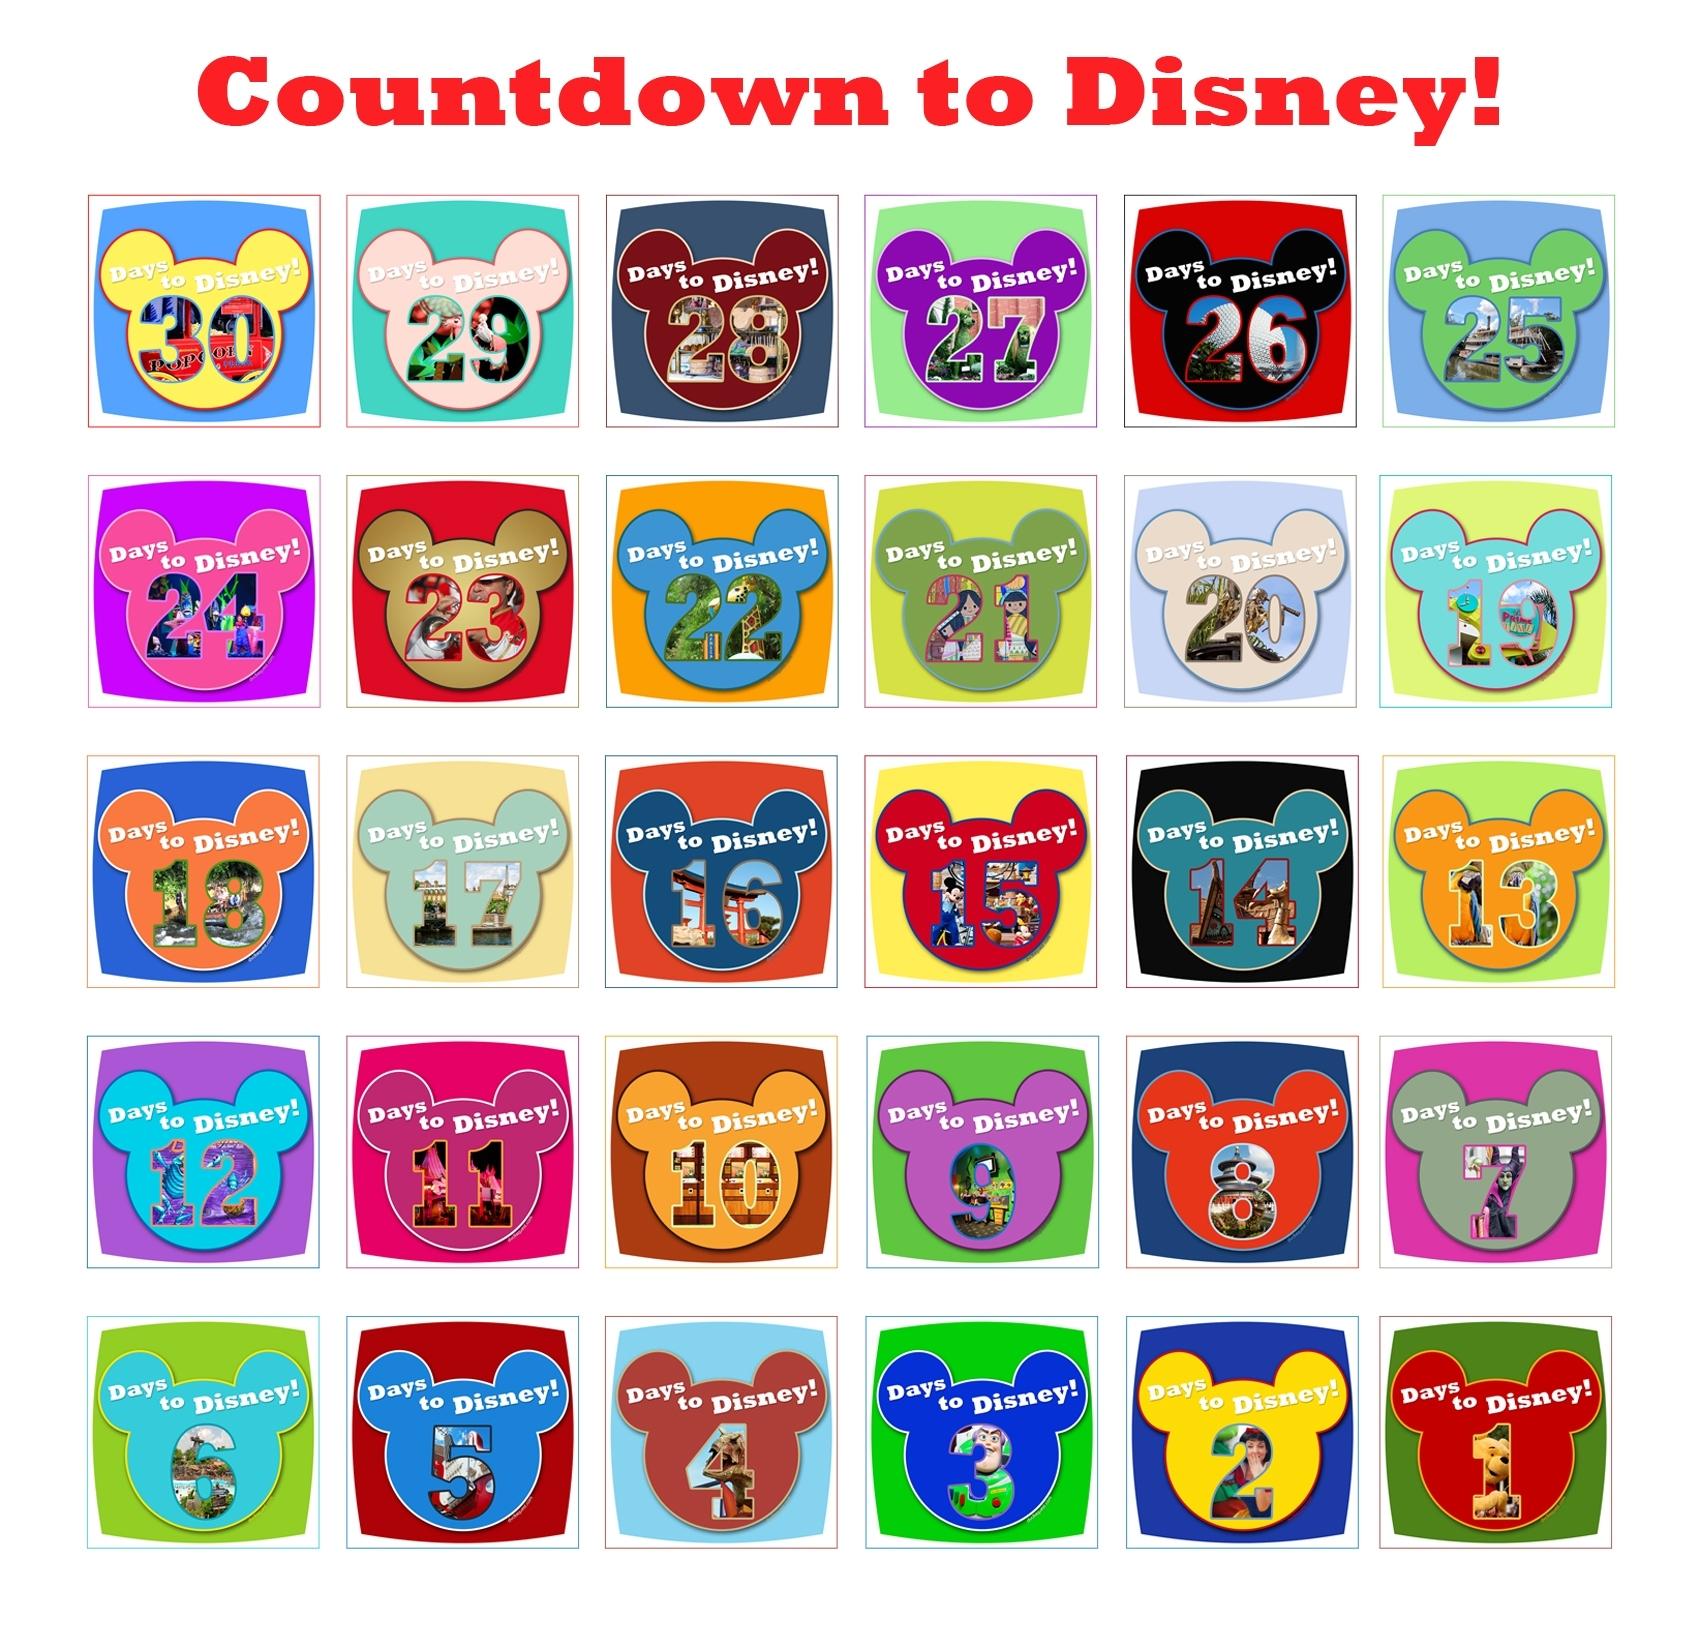 Disney Countdown Calendar Printable - Printable Calendar & Birthday inside Free Printable Vacation Countdown Calendar